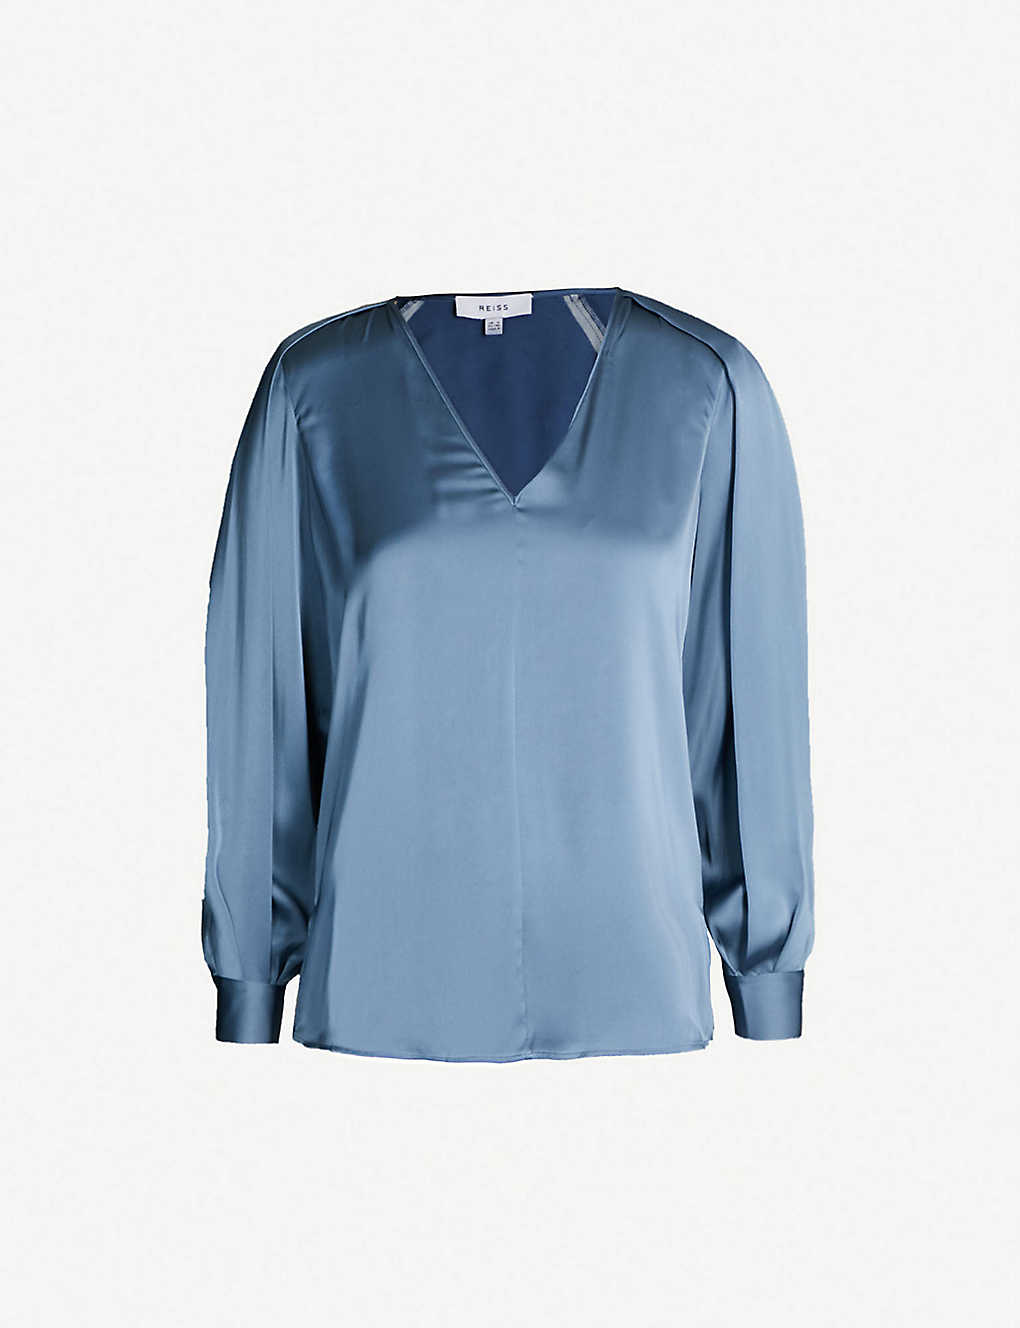 8e2d0066 REISS - Cora satin blouse   Selfridges.com